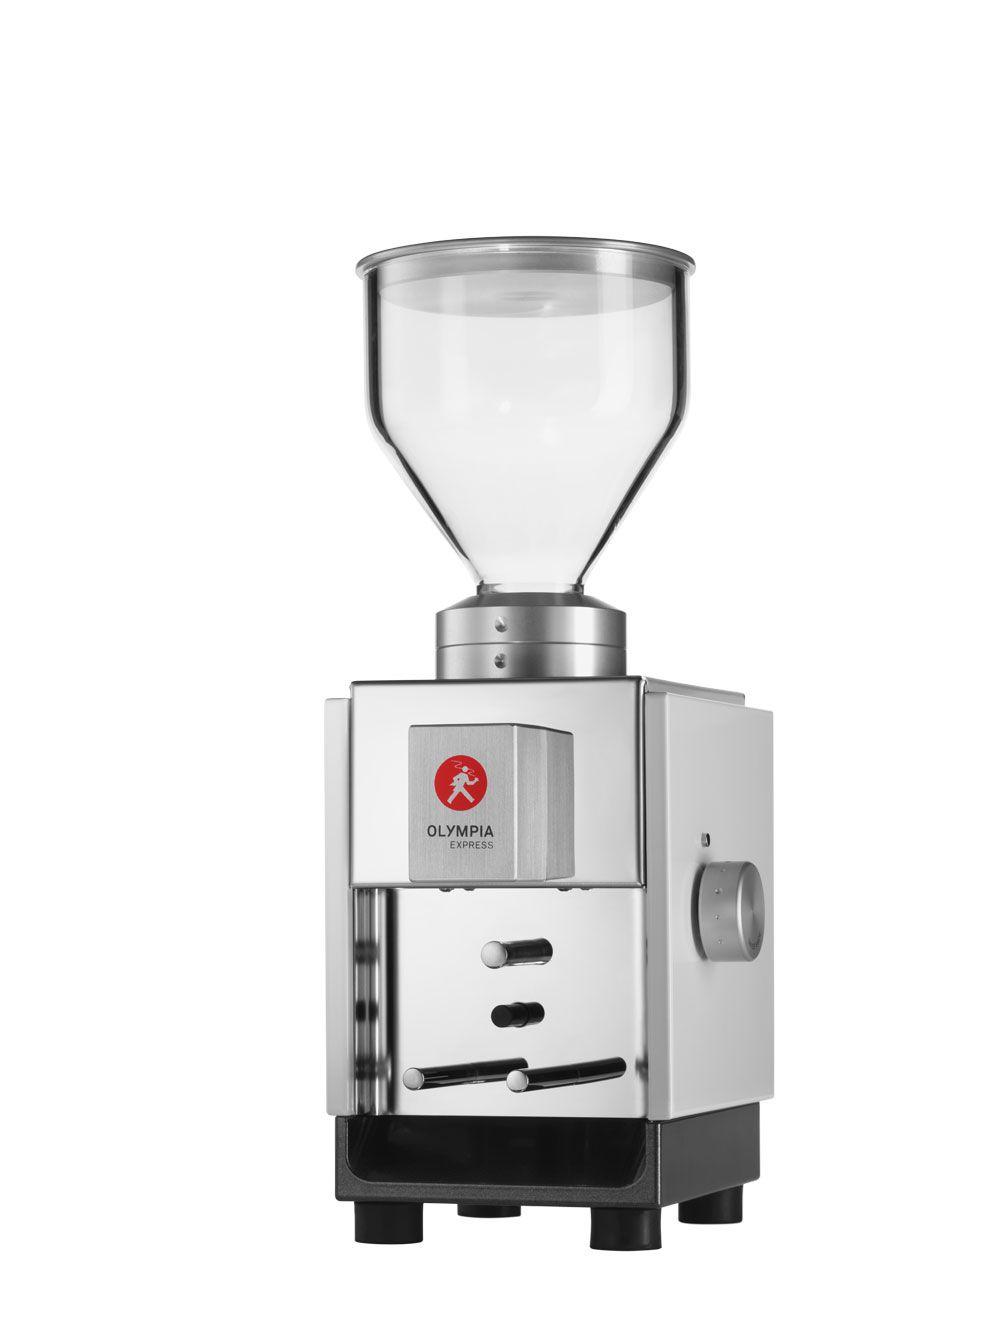 Olympia Express Moca Weiß Kaffeemühle